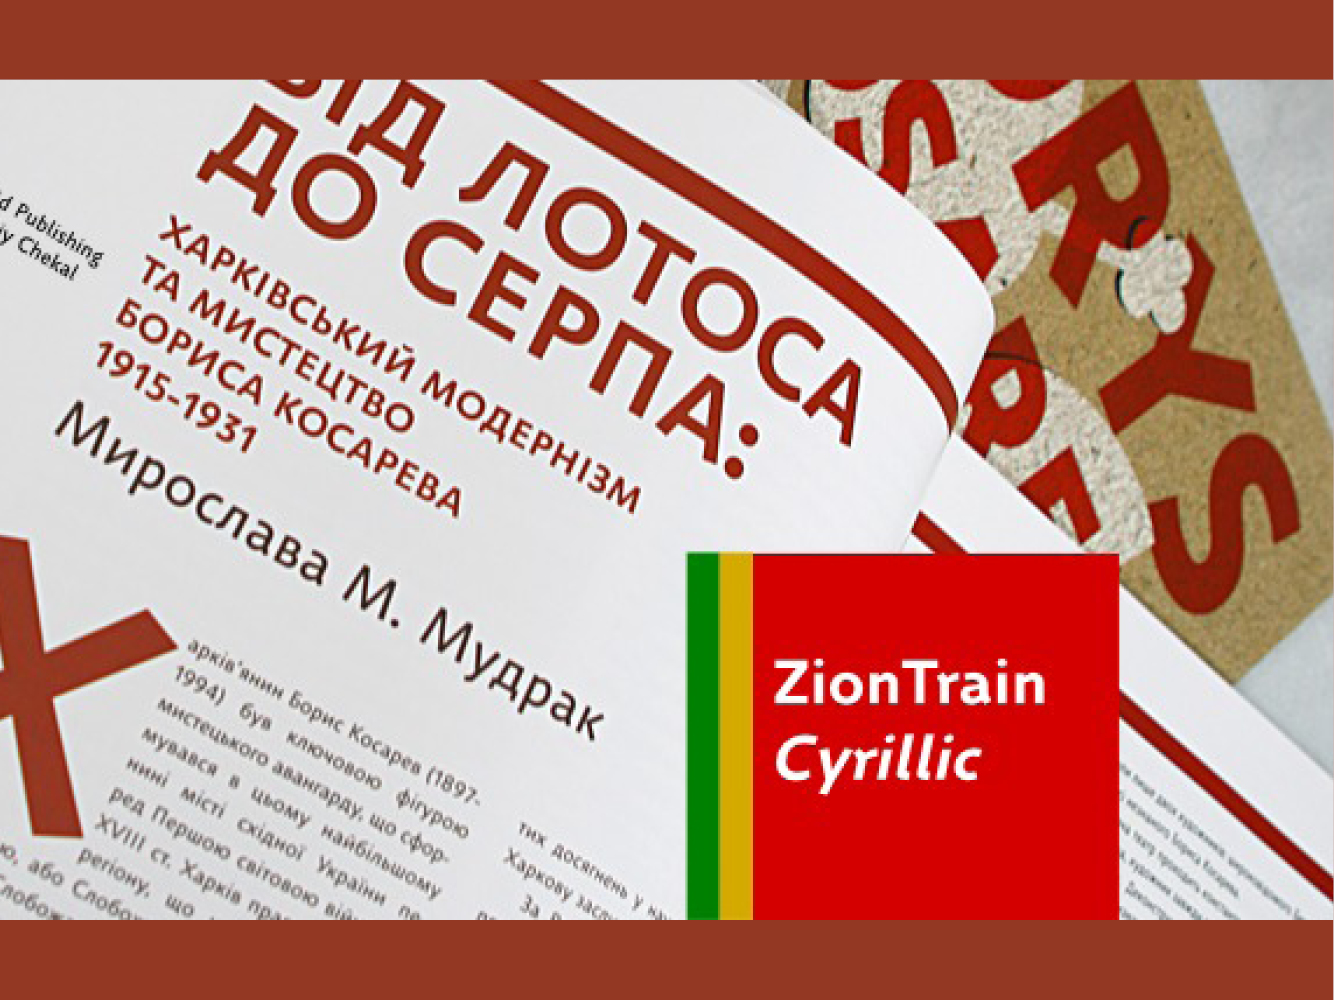 ZionTrain Cyrillic